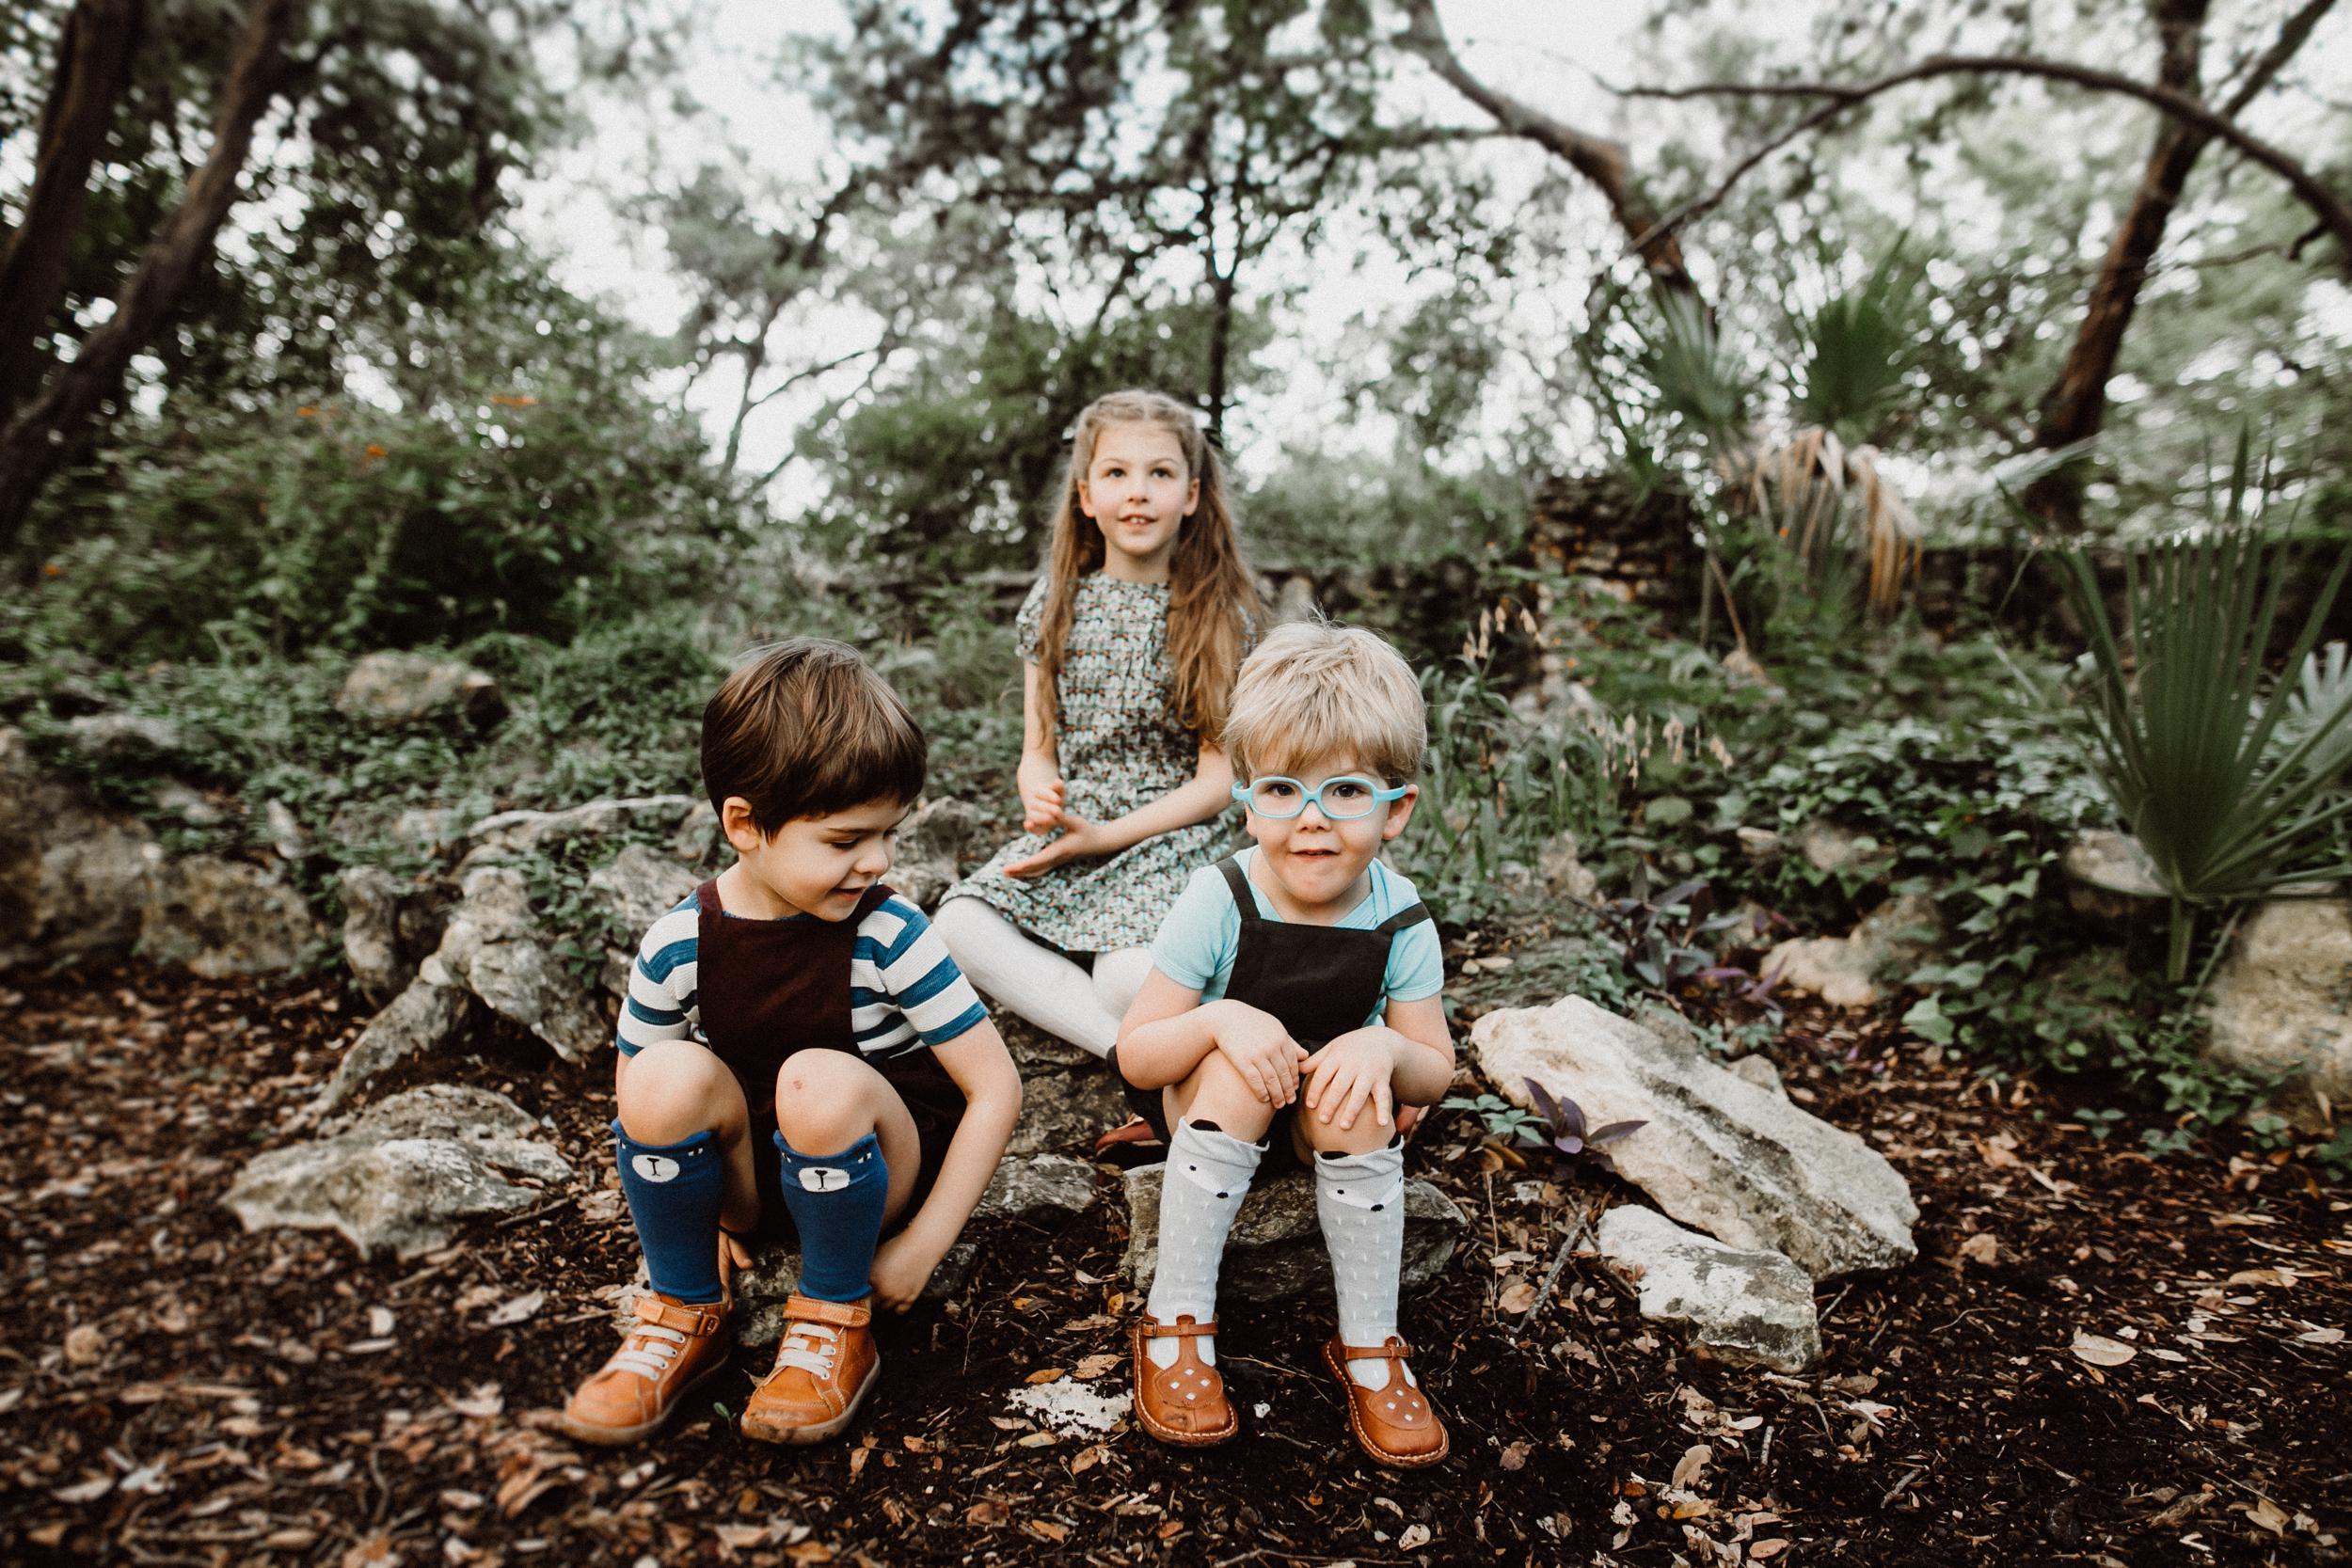 mayfield-park-natural-family-session-senning-55.jpg